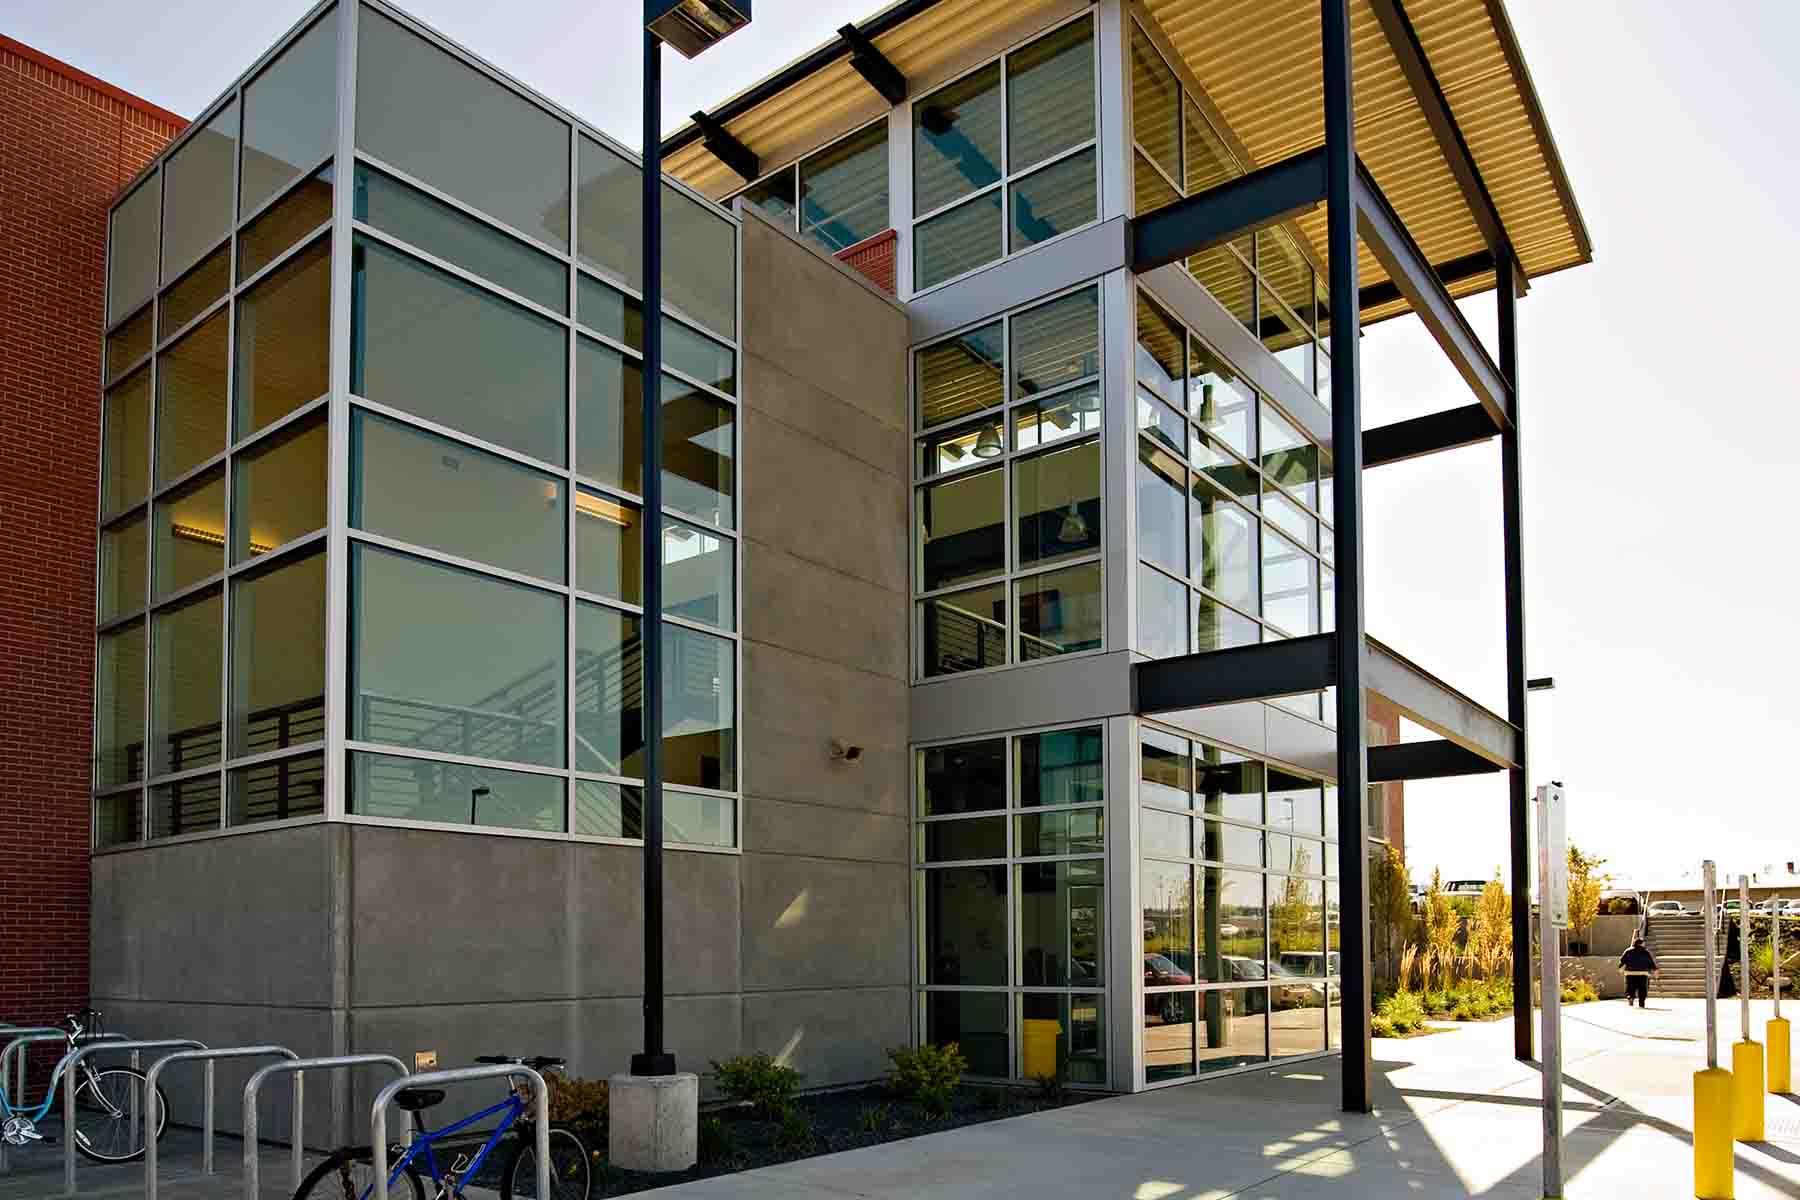 Spokane Community College <br/> Stannard Technical Education Building